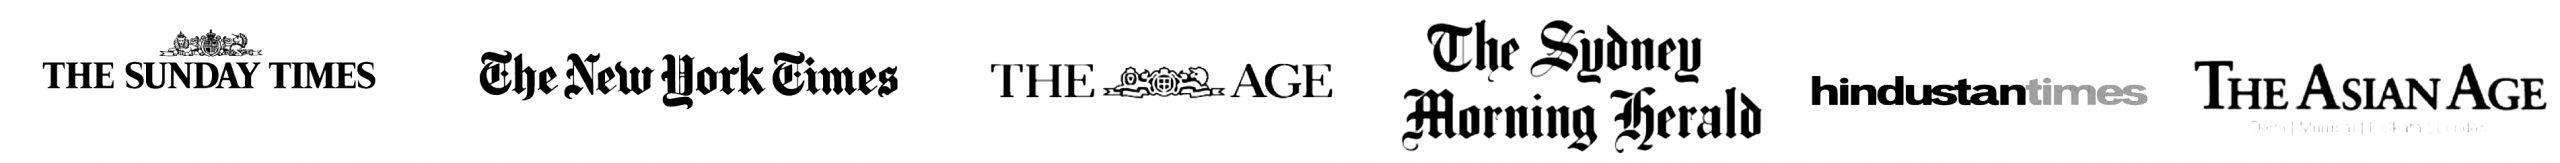 news-logo-banner-1